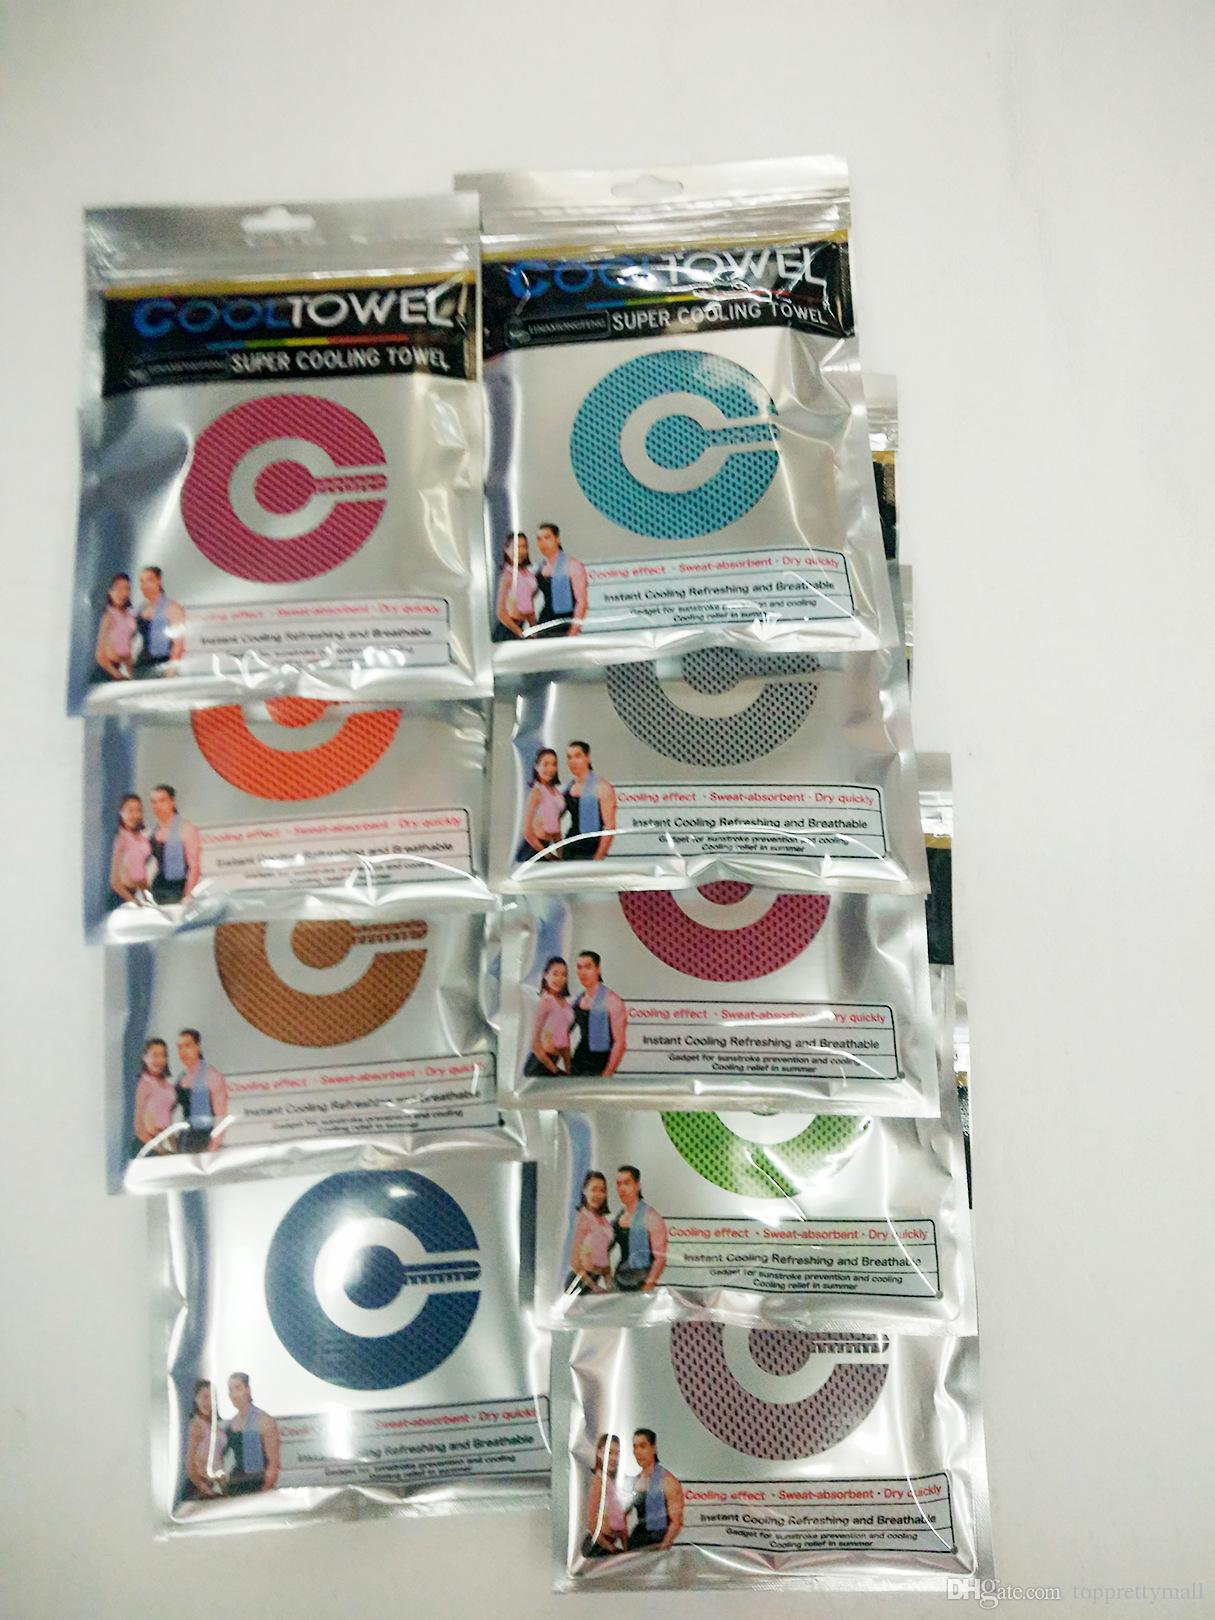 Whosale Cooling Towel Exercise Sweat Summer Sports منشفة باردة للثلج PVA انخفاض درجة حرارة الجسم